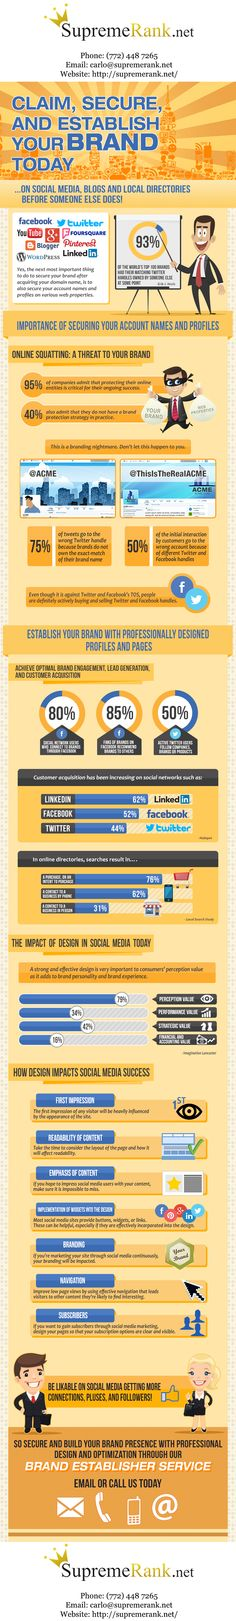 SupremeRank.net Web Design & Brand Optimization - Brand Establisher Infographic